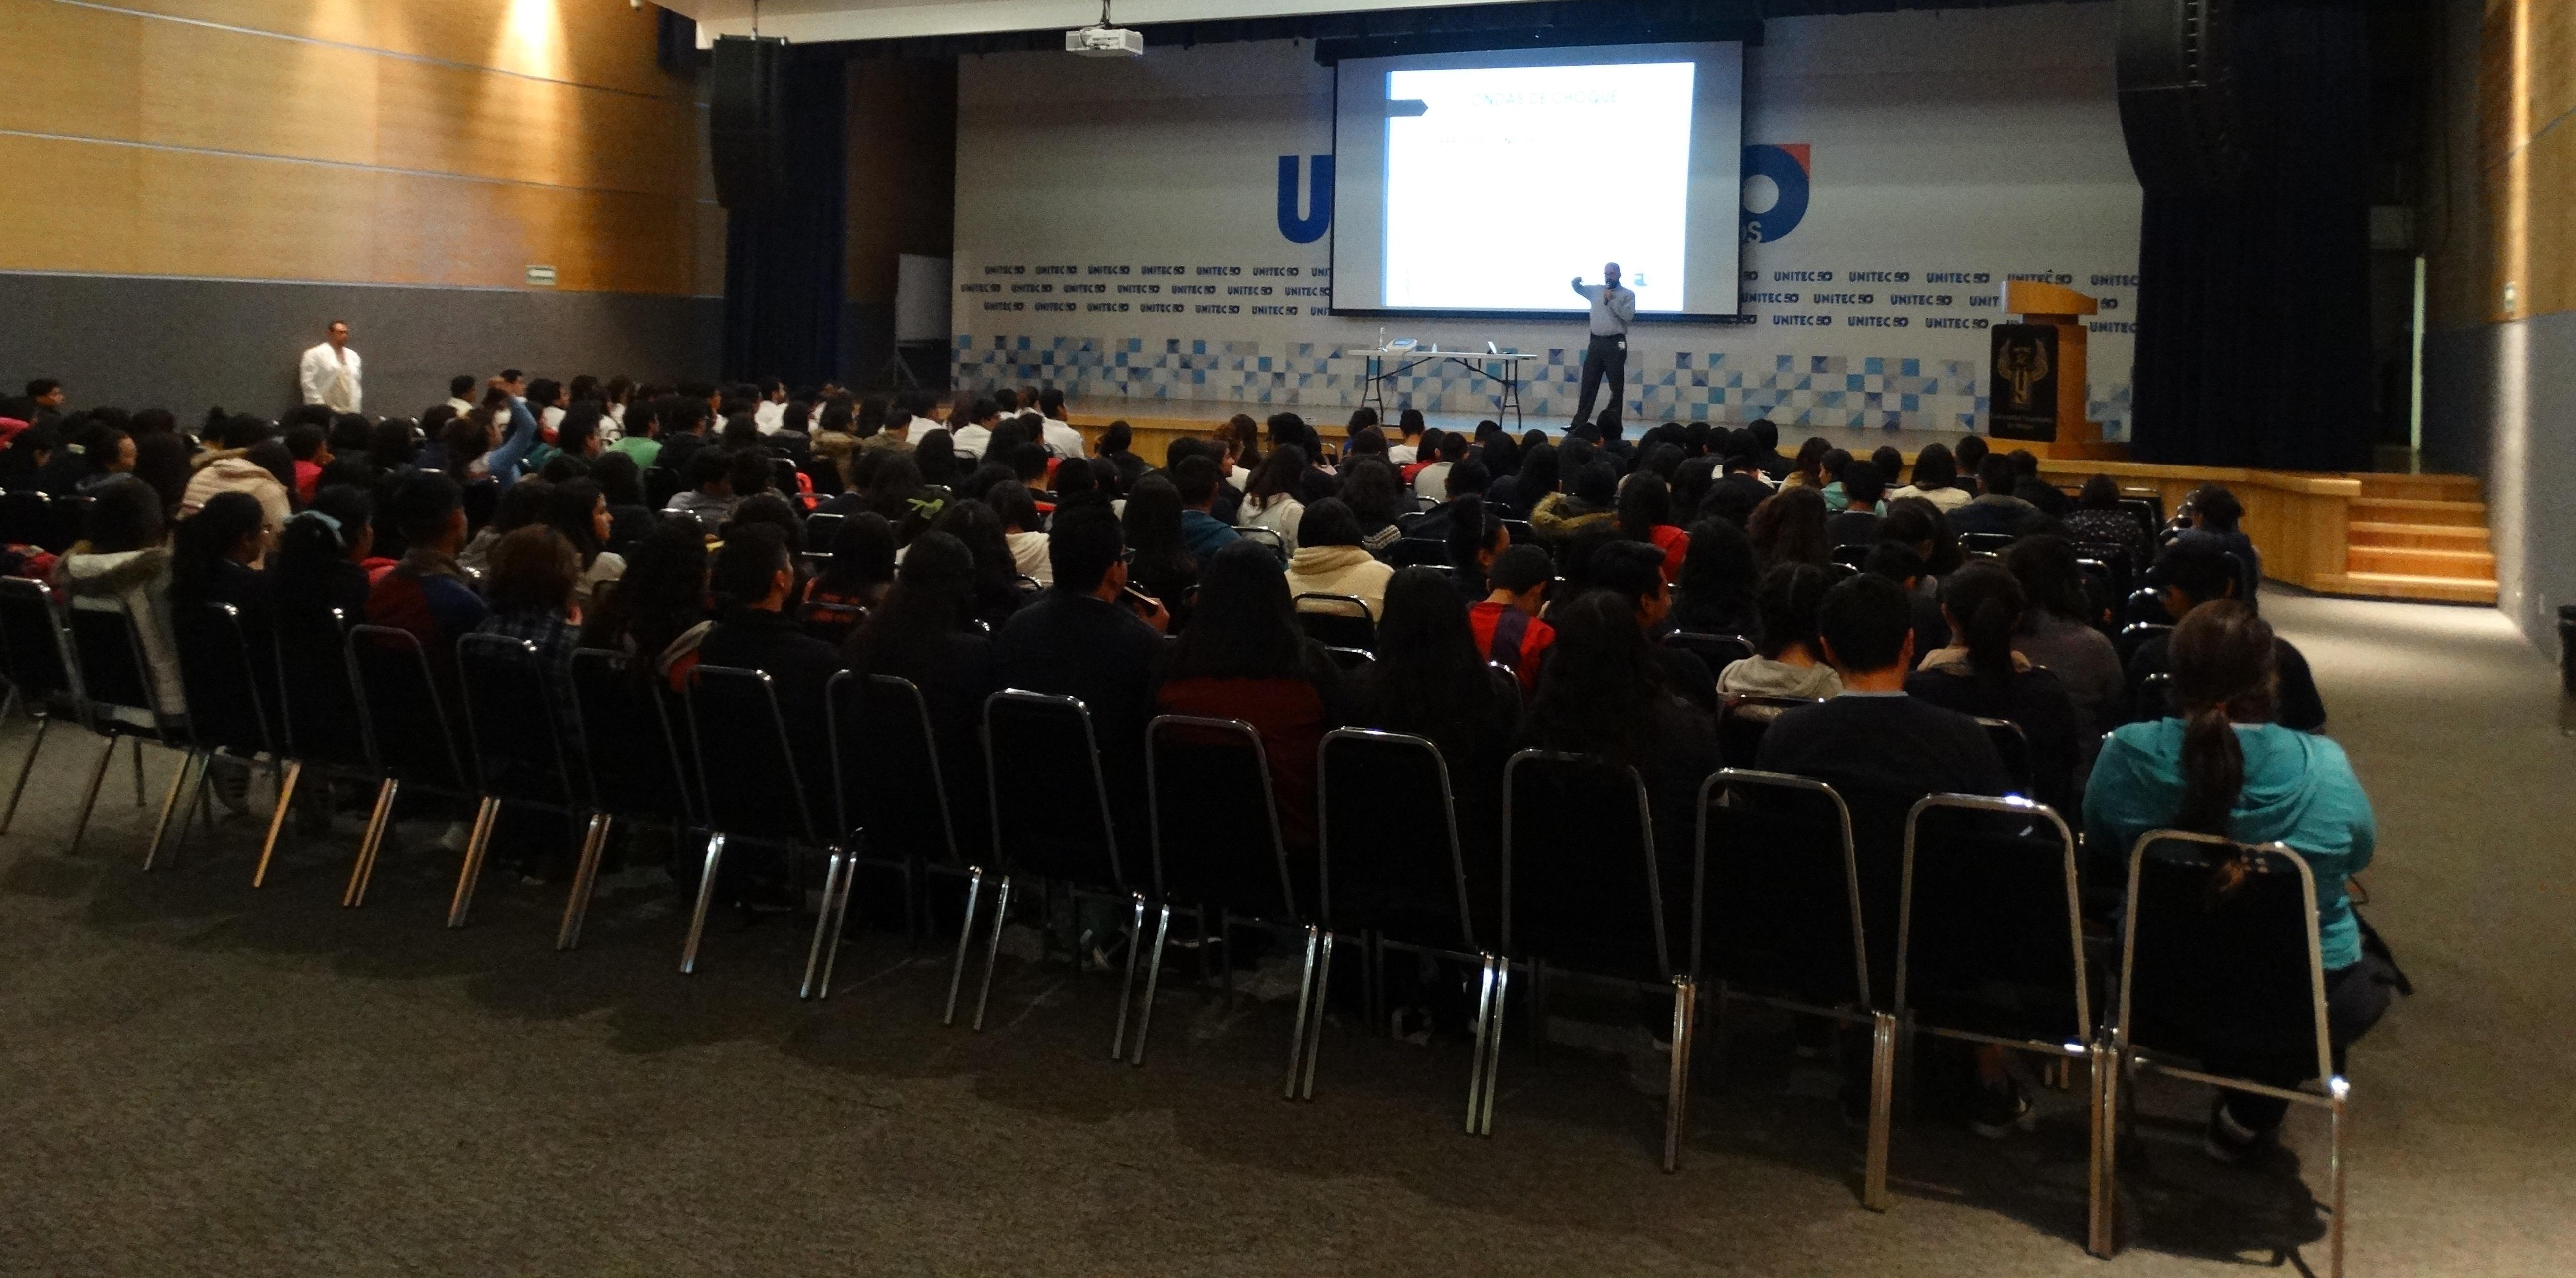 Celebran 11ª Semana de la Salud en UNITEC Campus Toluca